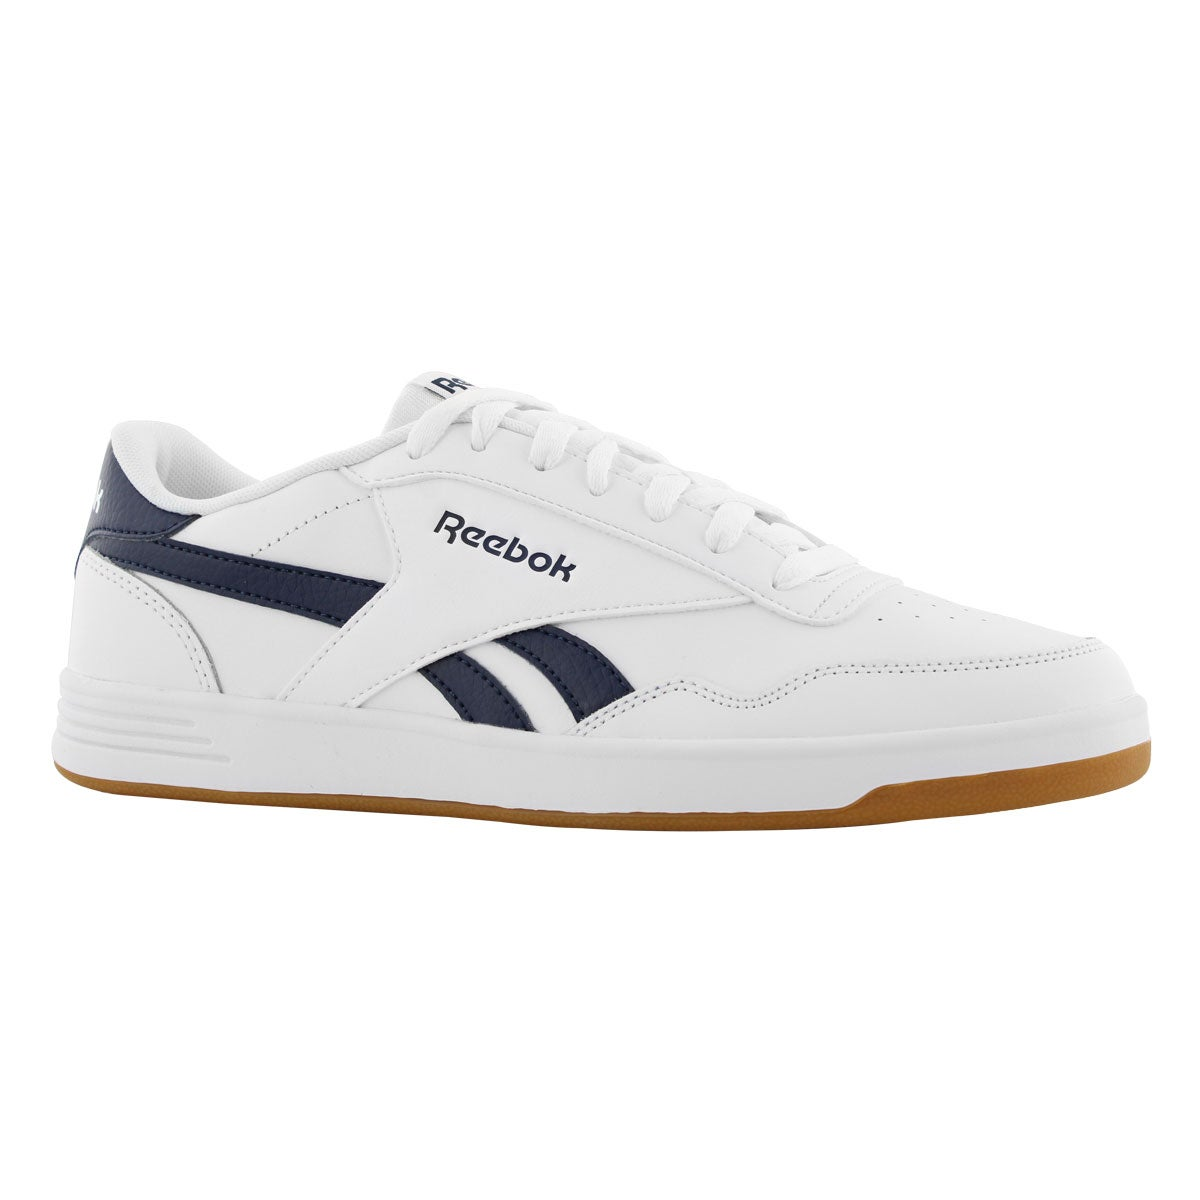 Mns Techque T wht/nvy fashion sneaker